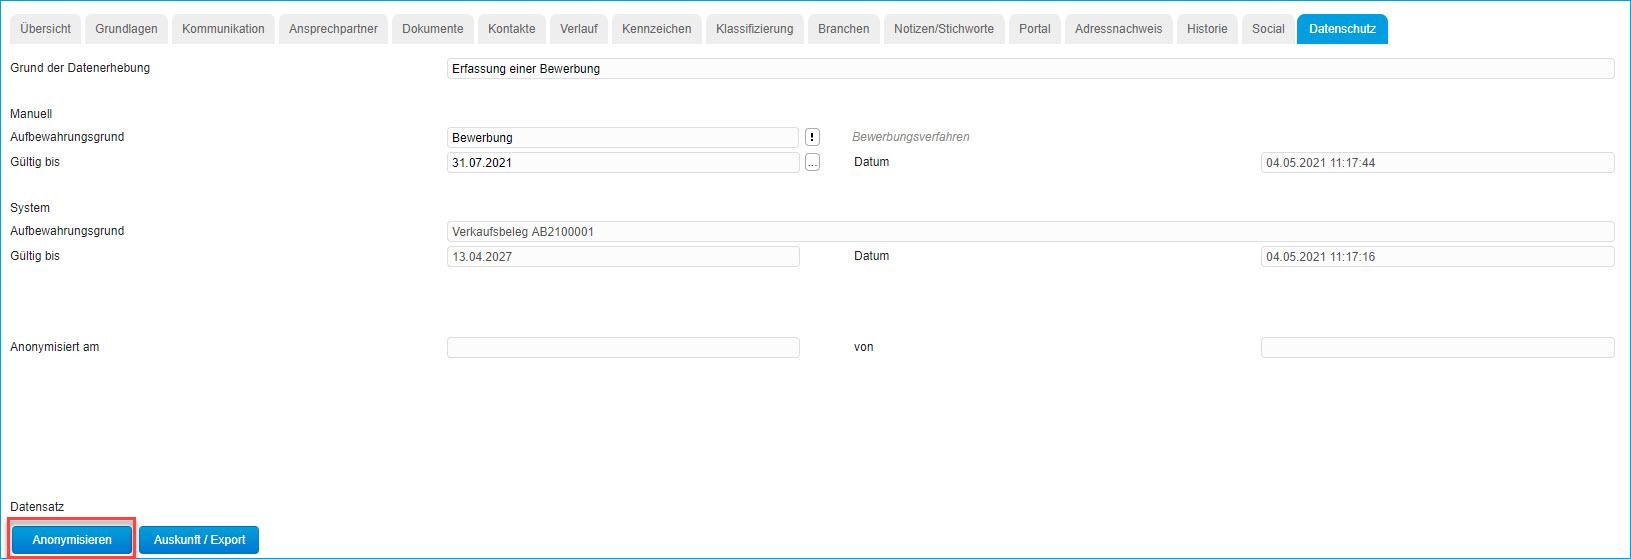 Register Datenschutz 2